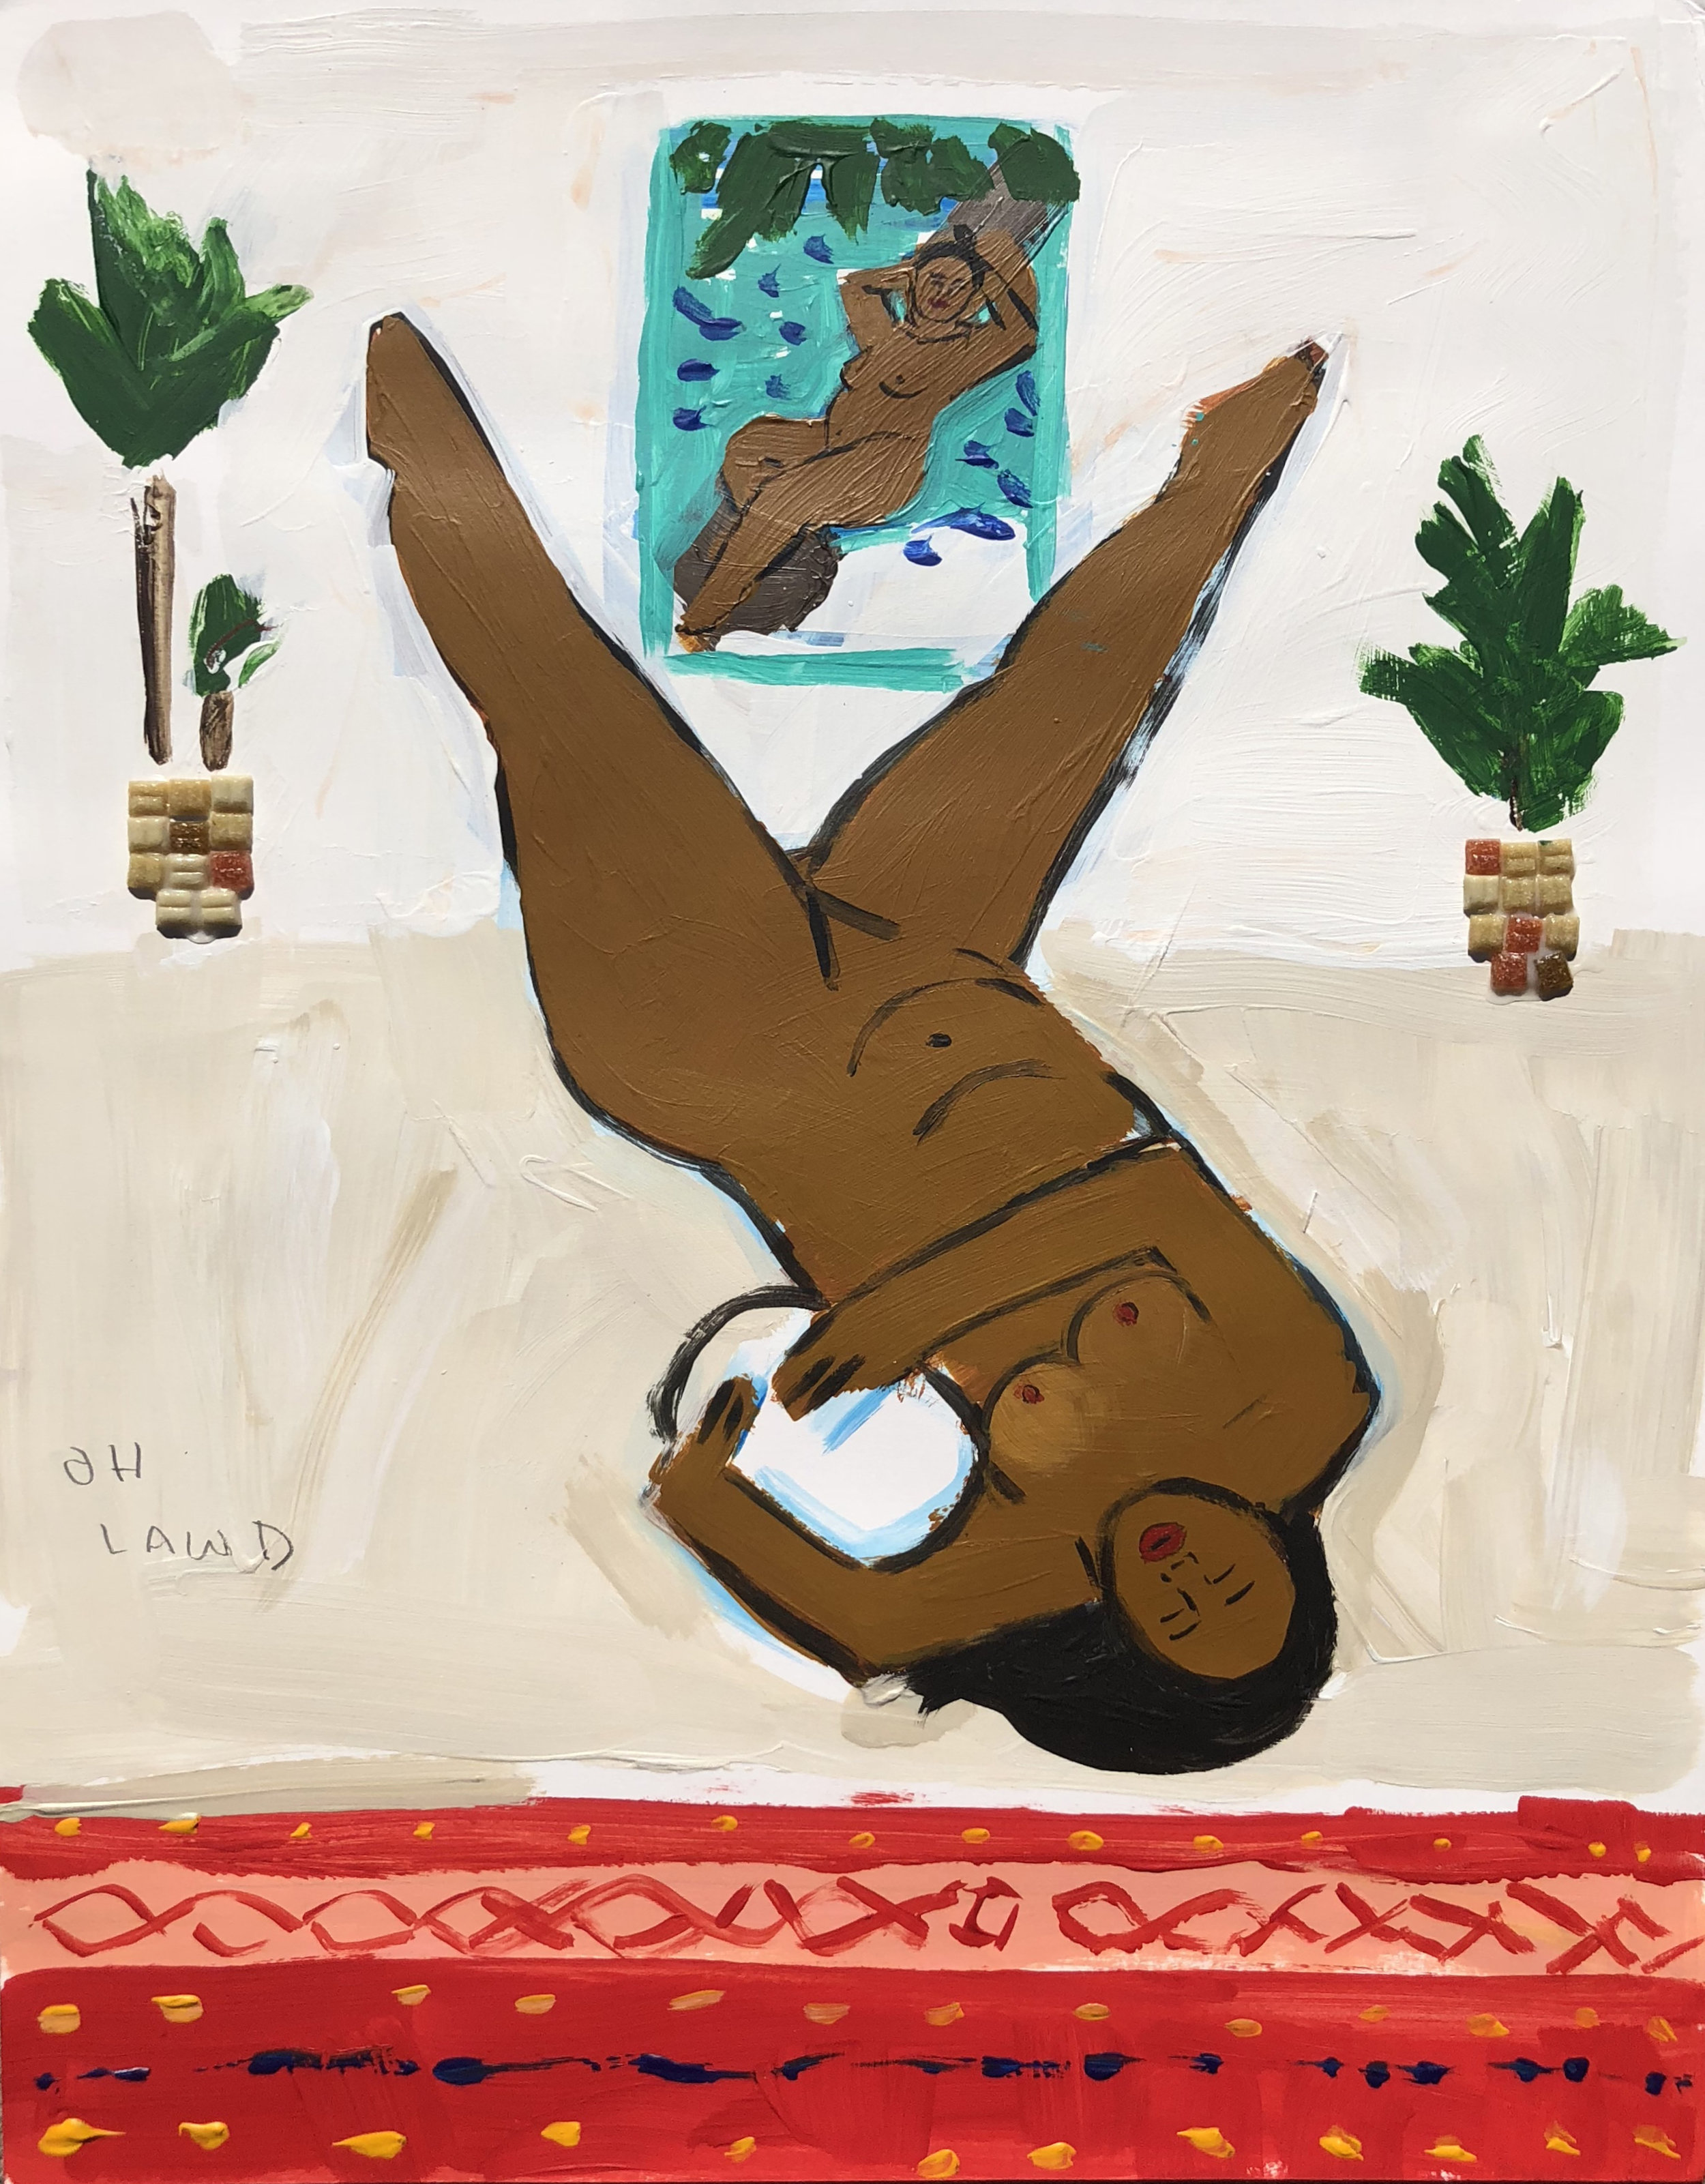 MONICA KIM GARZA / Leg Levitation / 2016 / Mixed media on paper / 24 x 18 inches